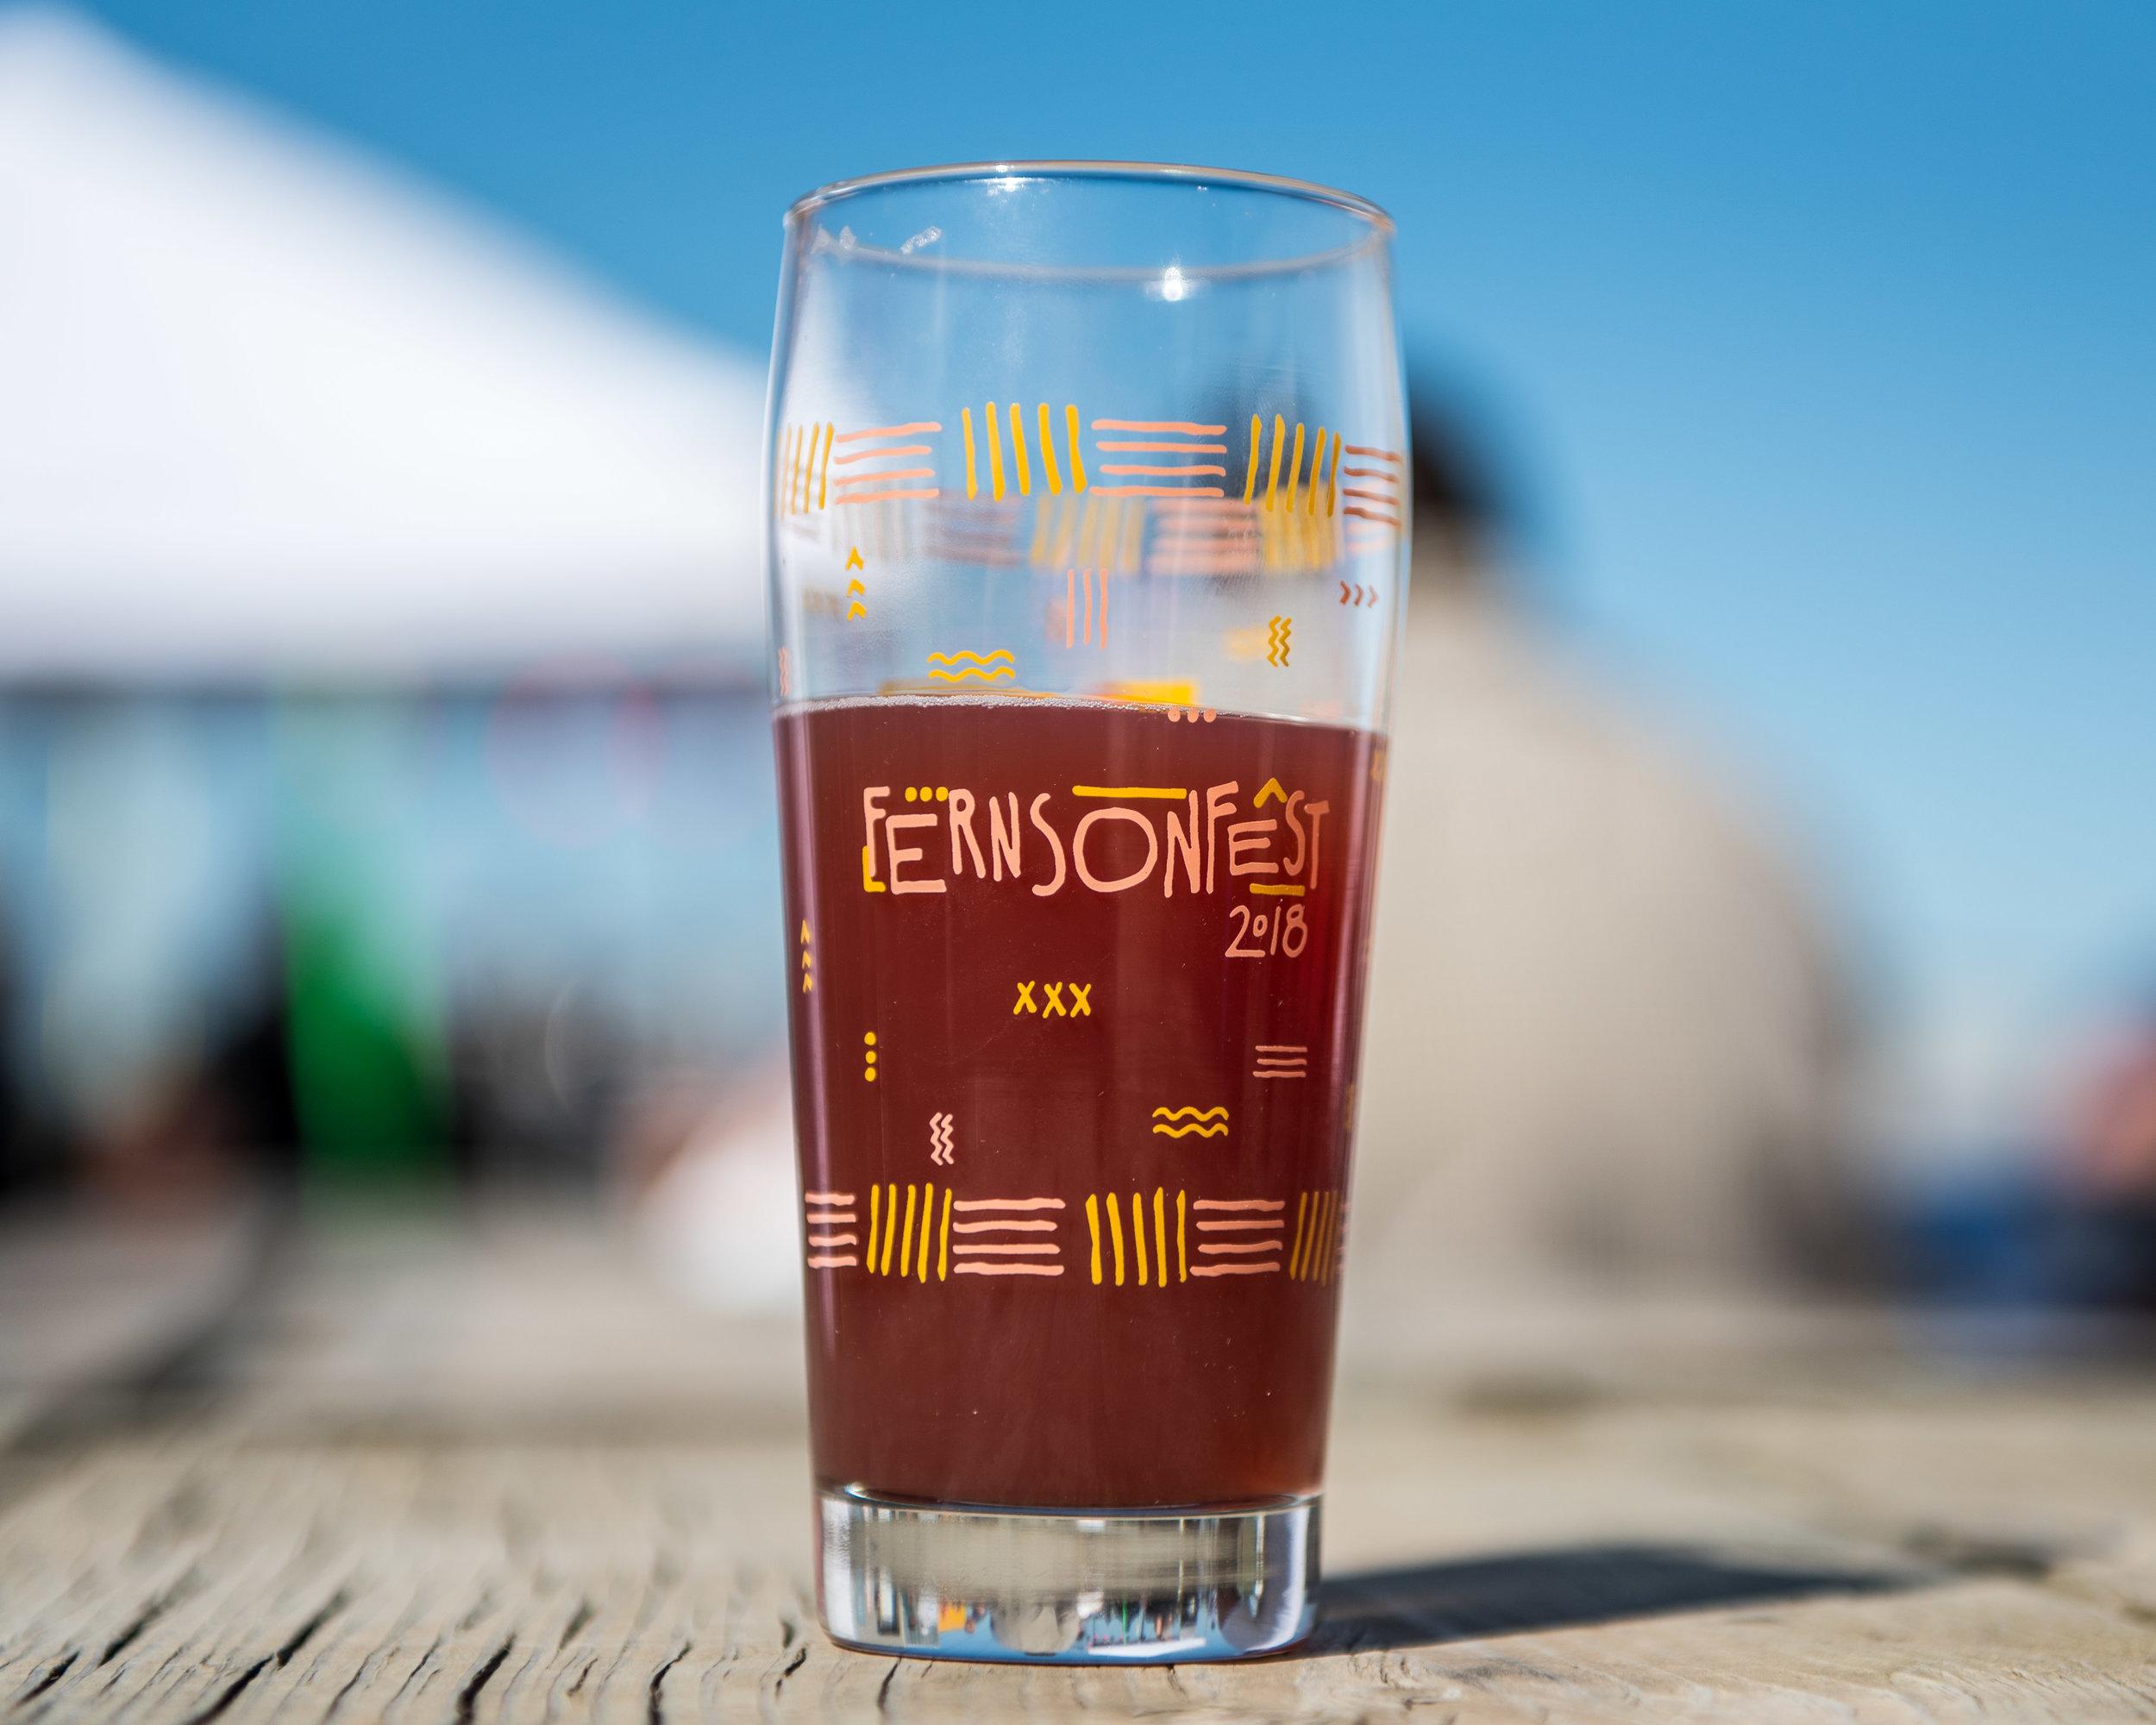 Fernson Fest 2018-7.jpg